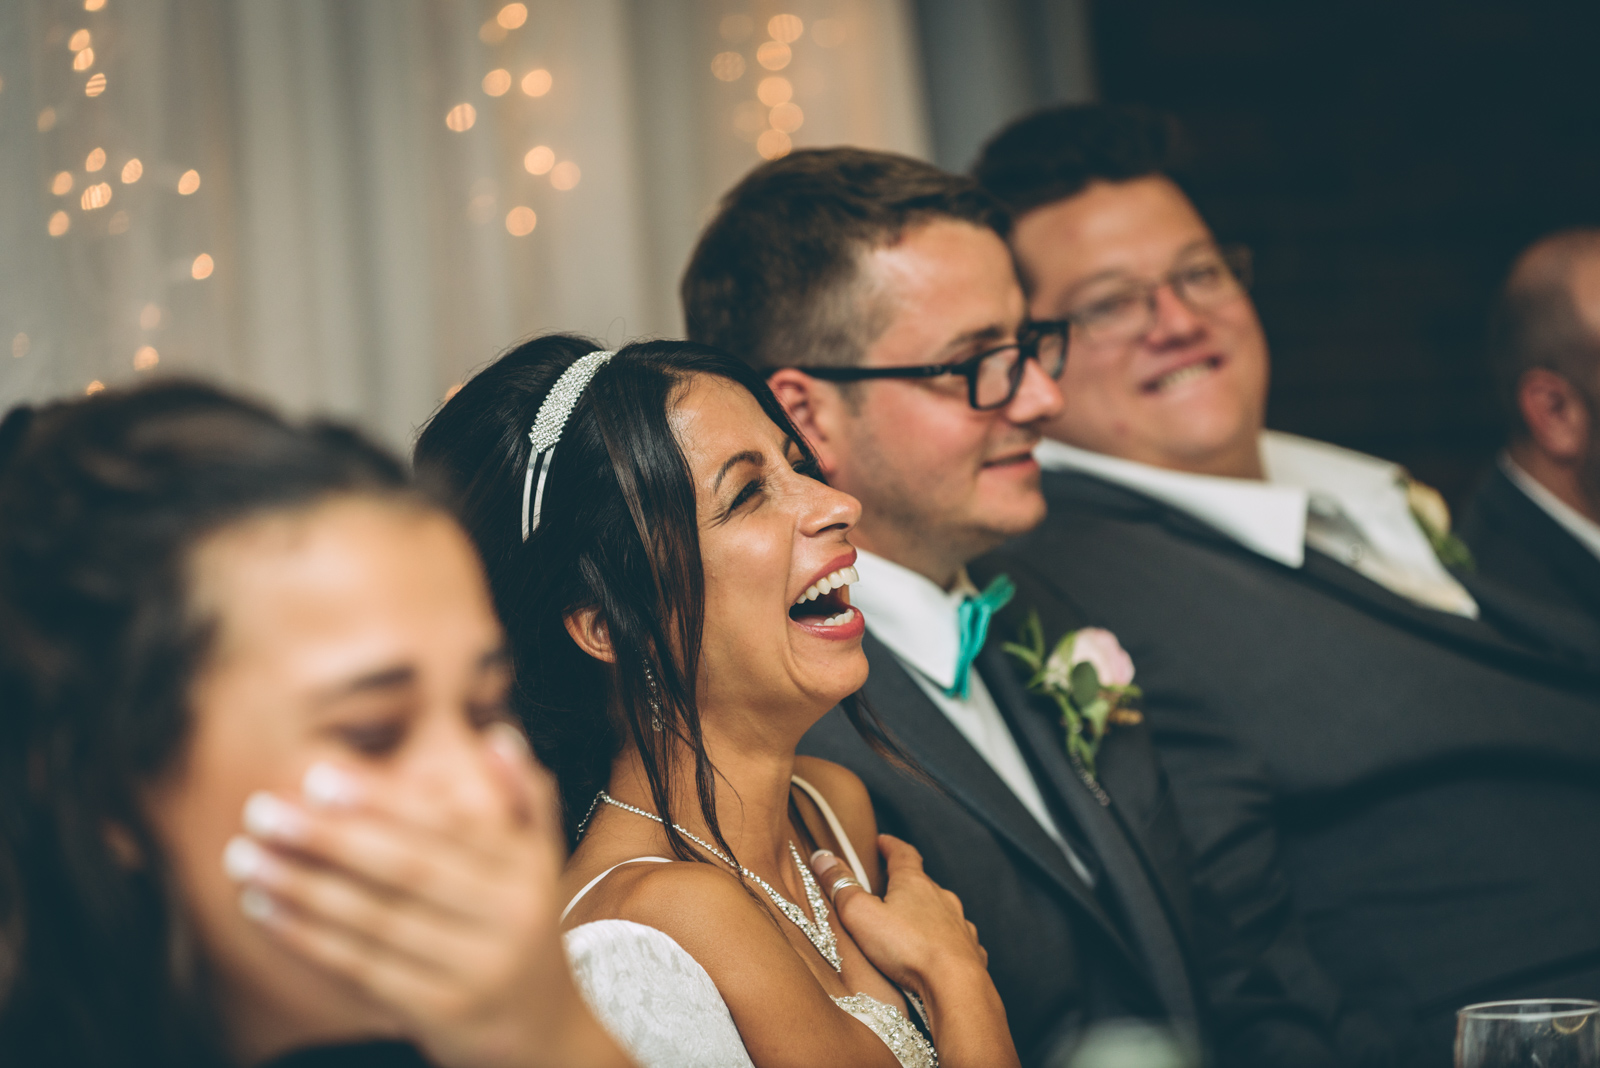 top-wedding-photos-2018-blog-82.jpg